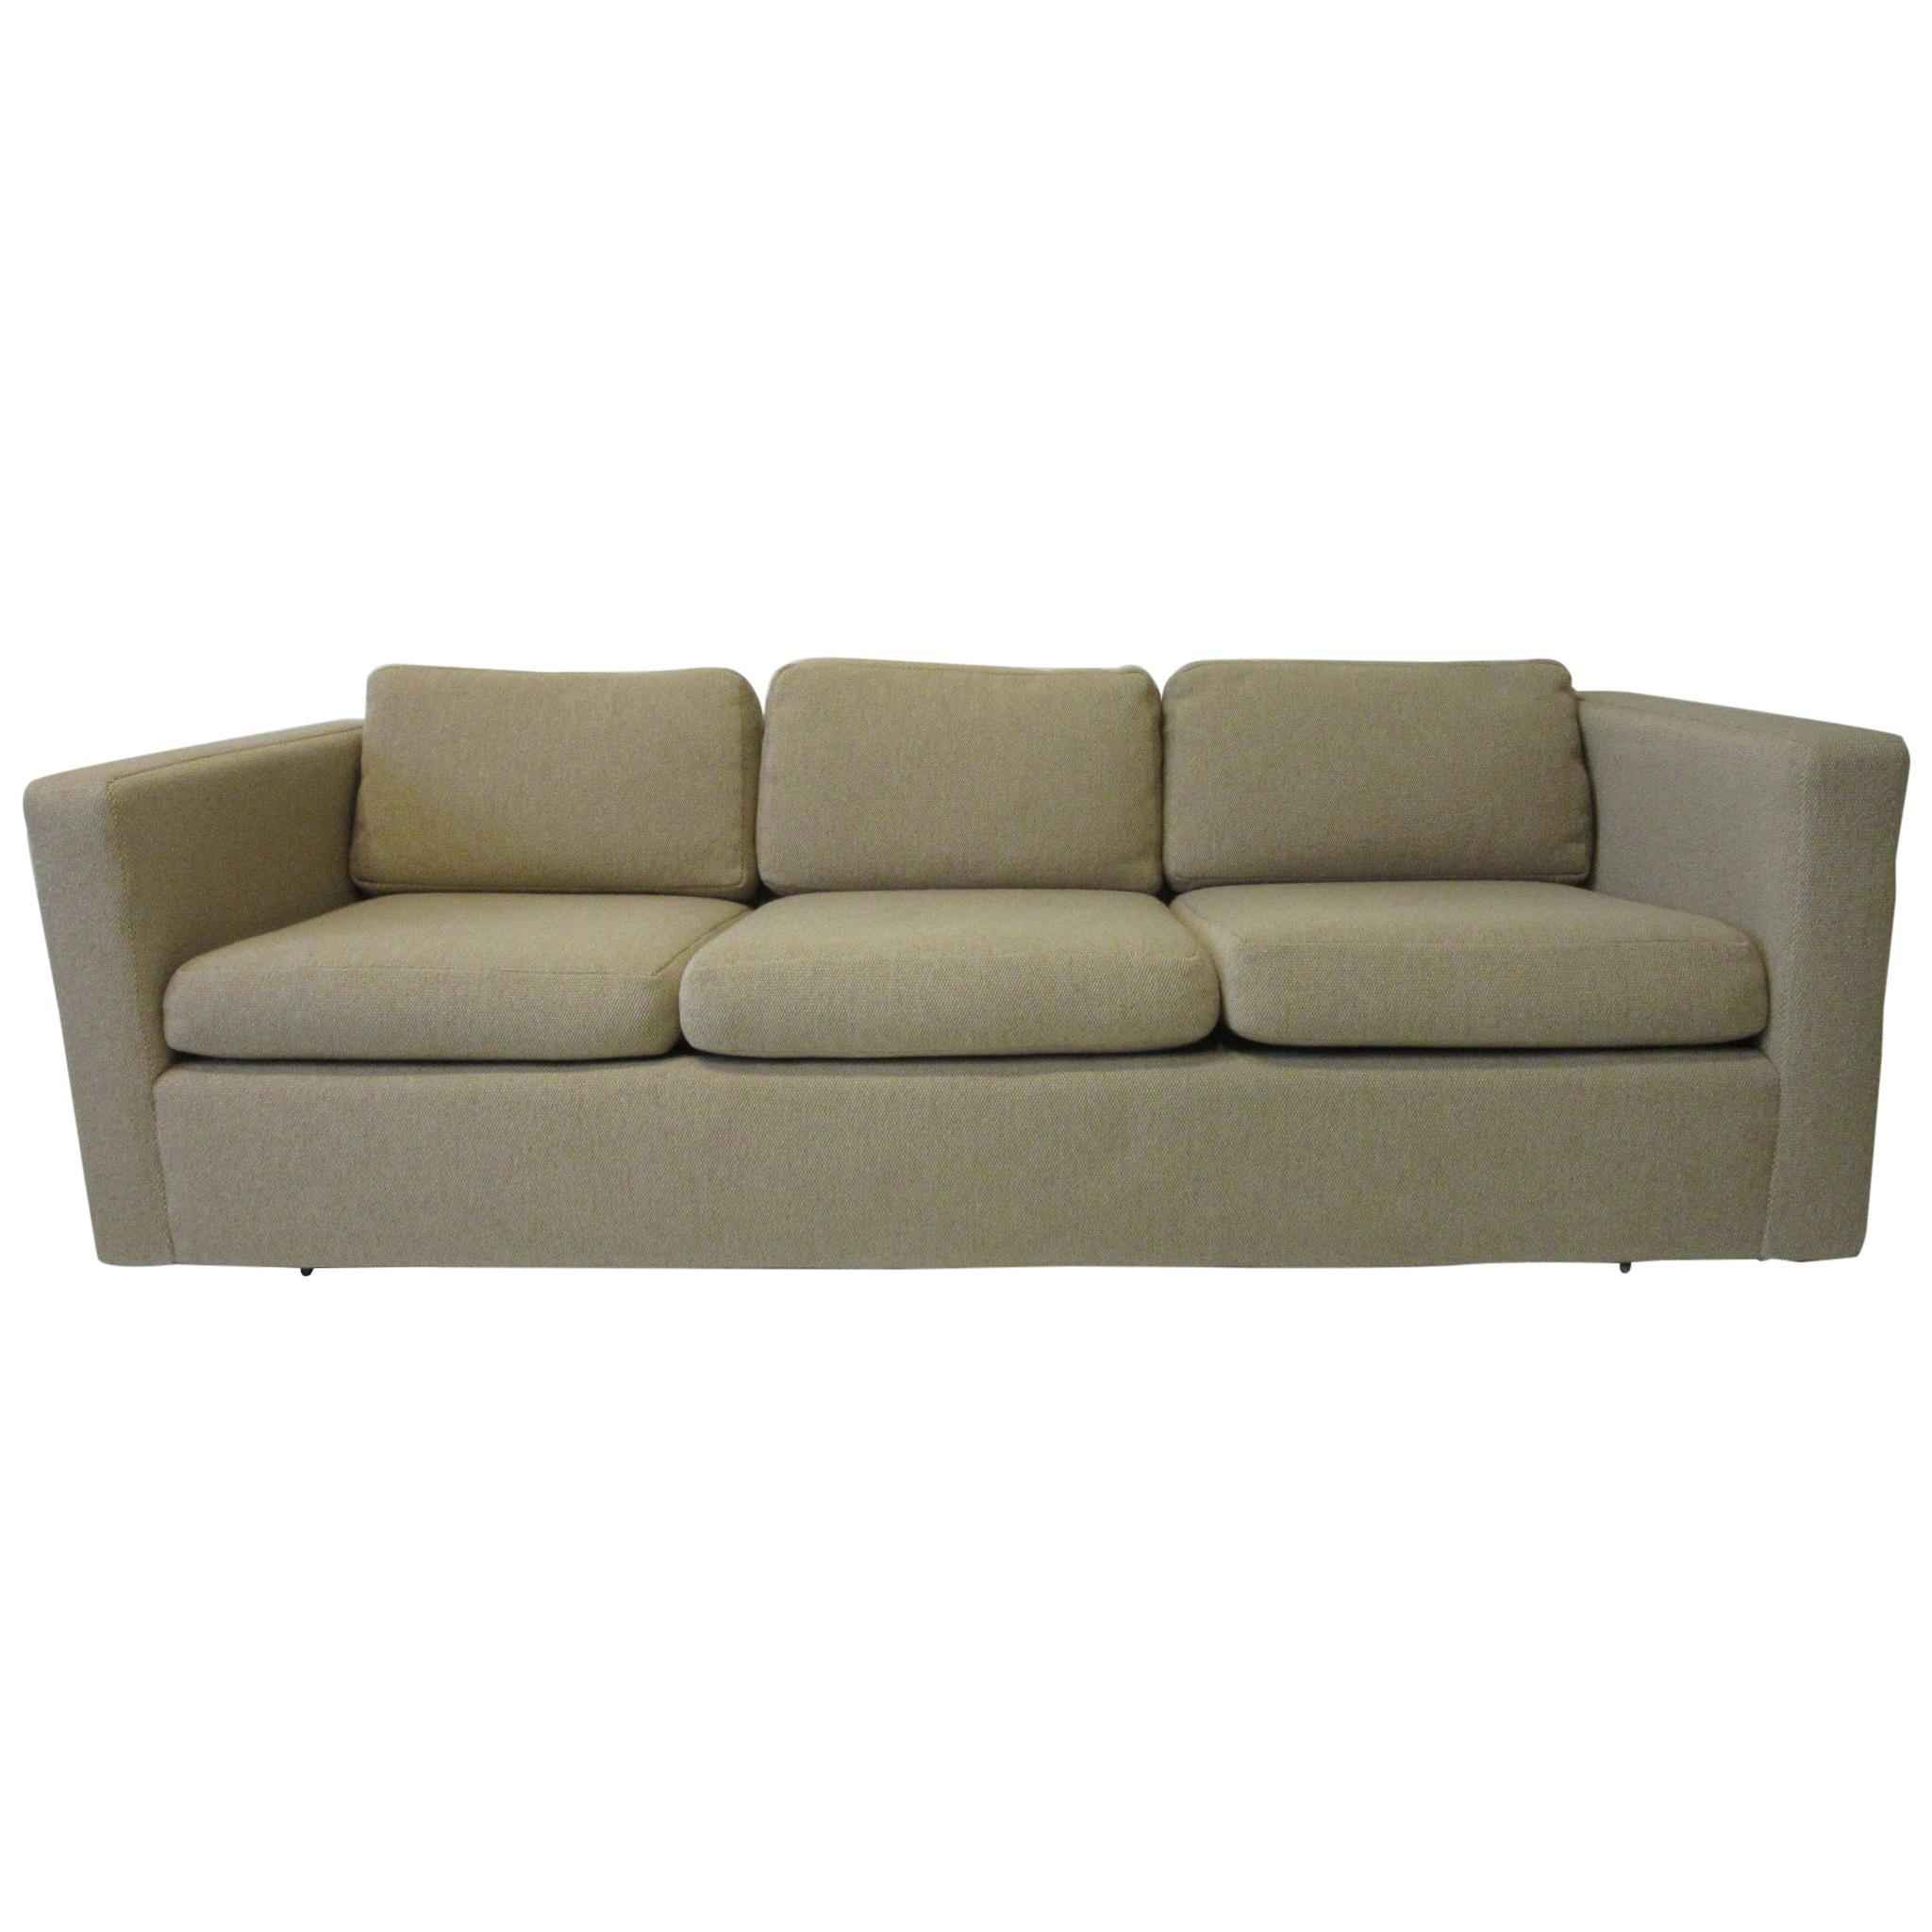 Milo Baughman Tuxedo Styled Sofa for Thayer Coggin